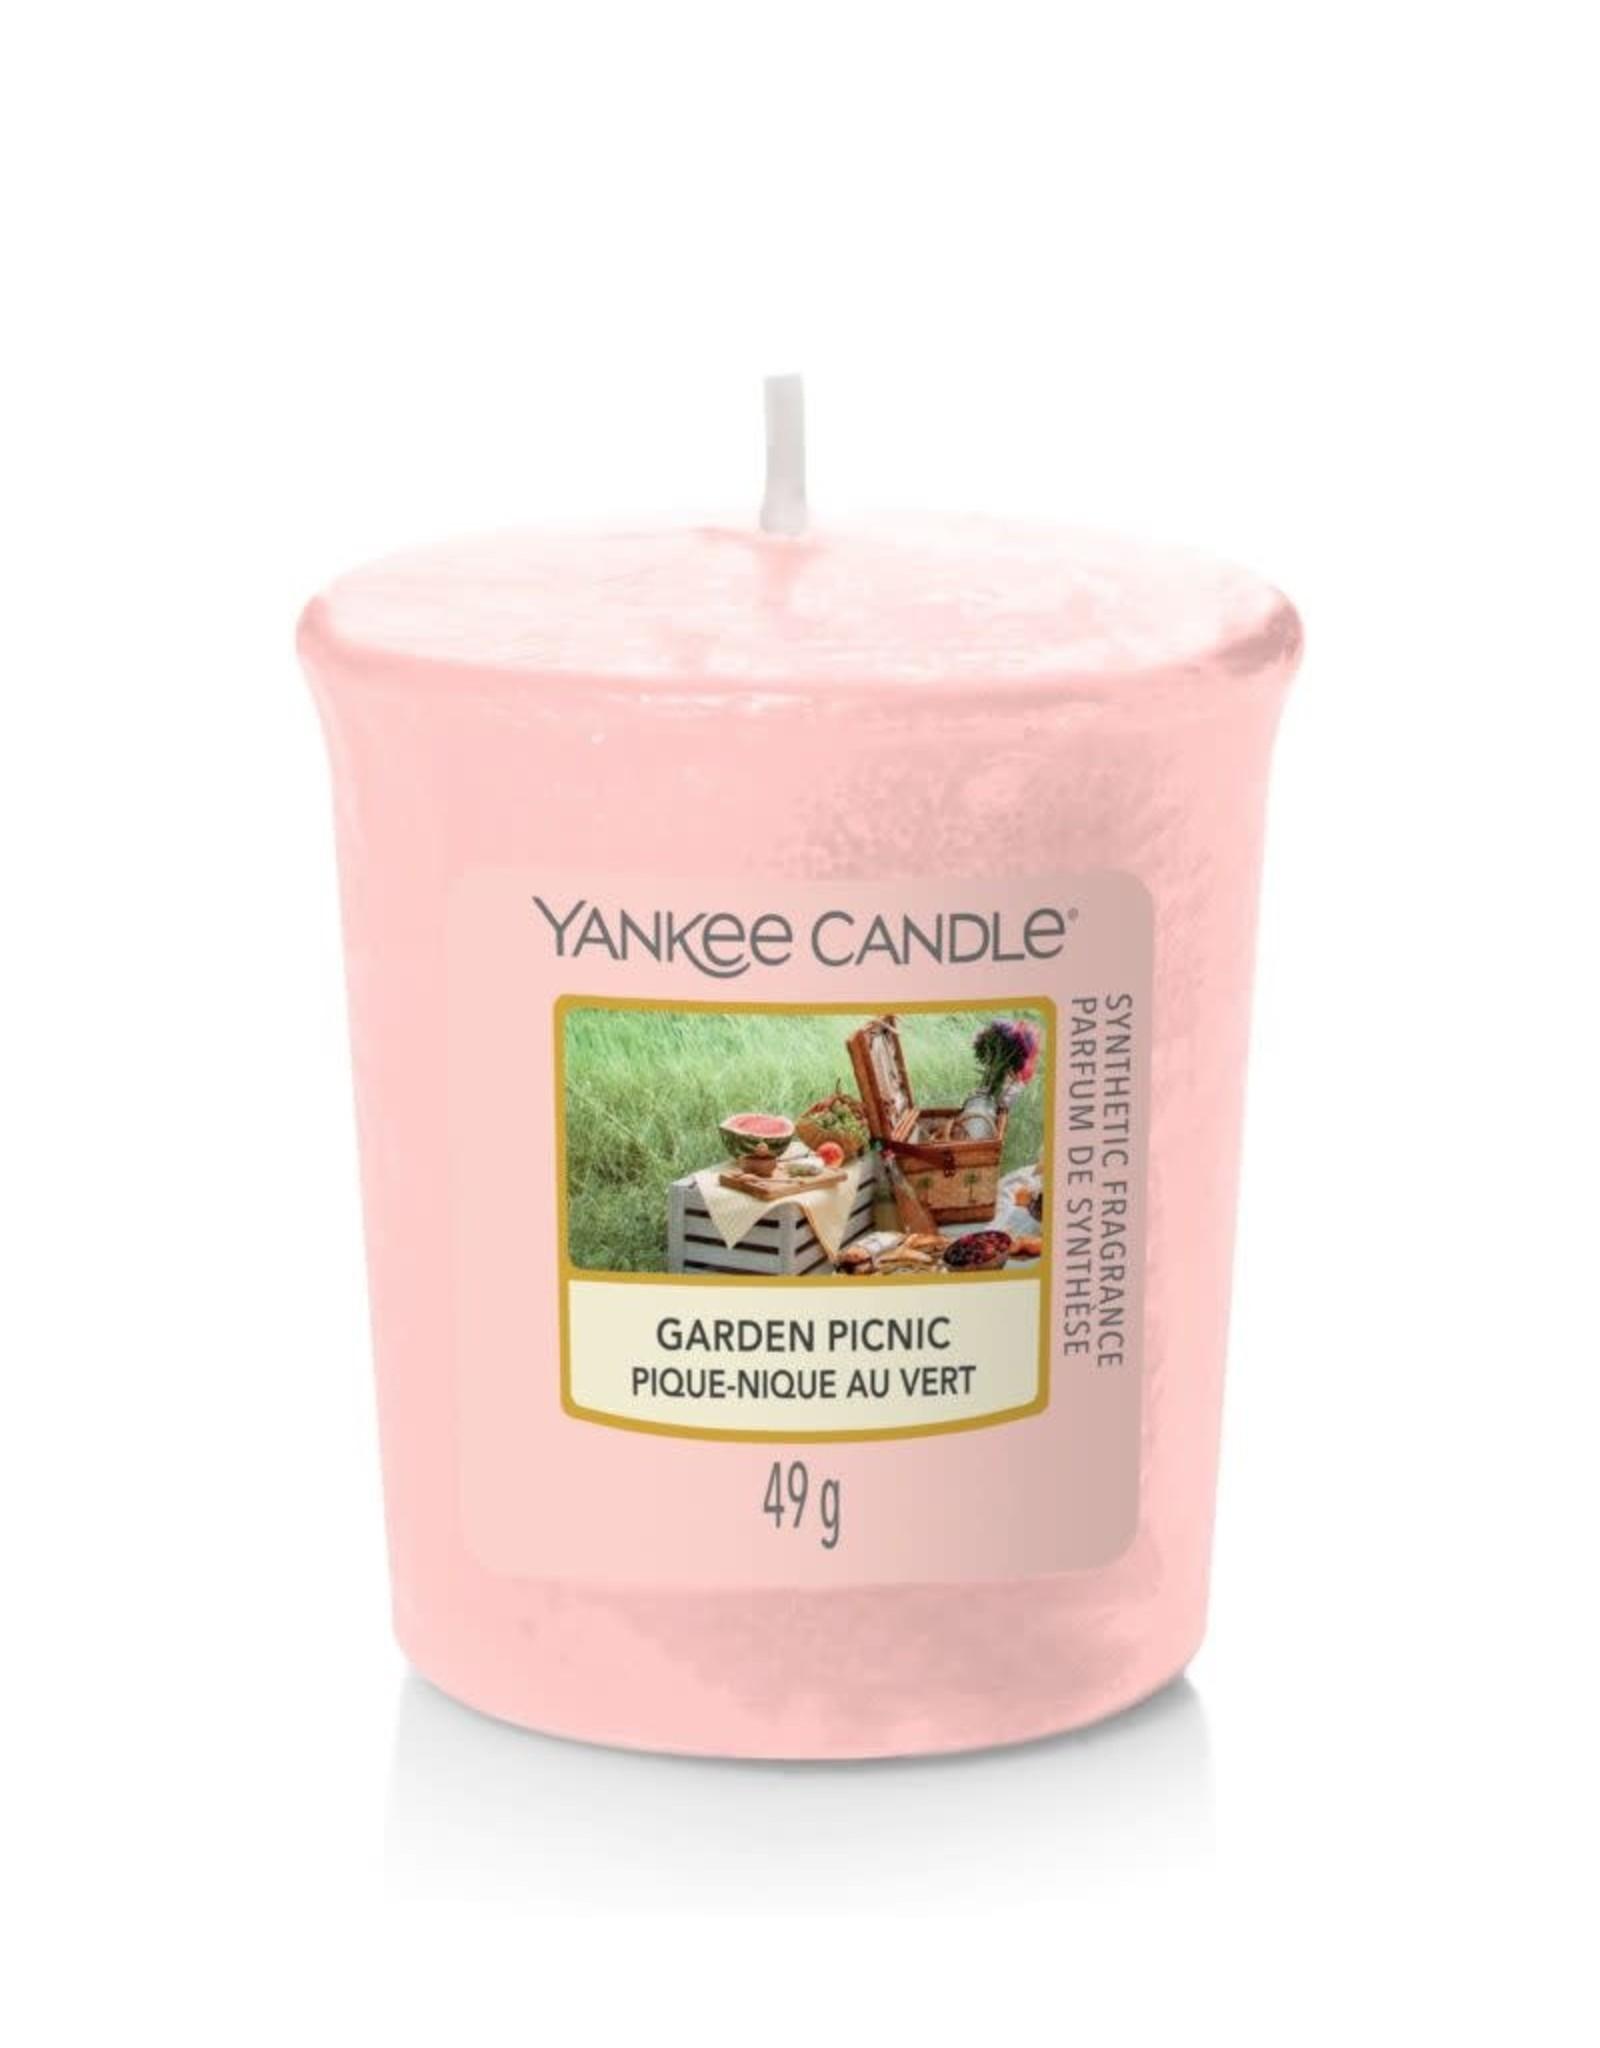 Yankee Candle Garden Picnic Yankee Candle